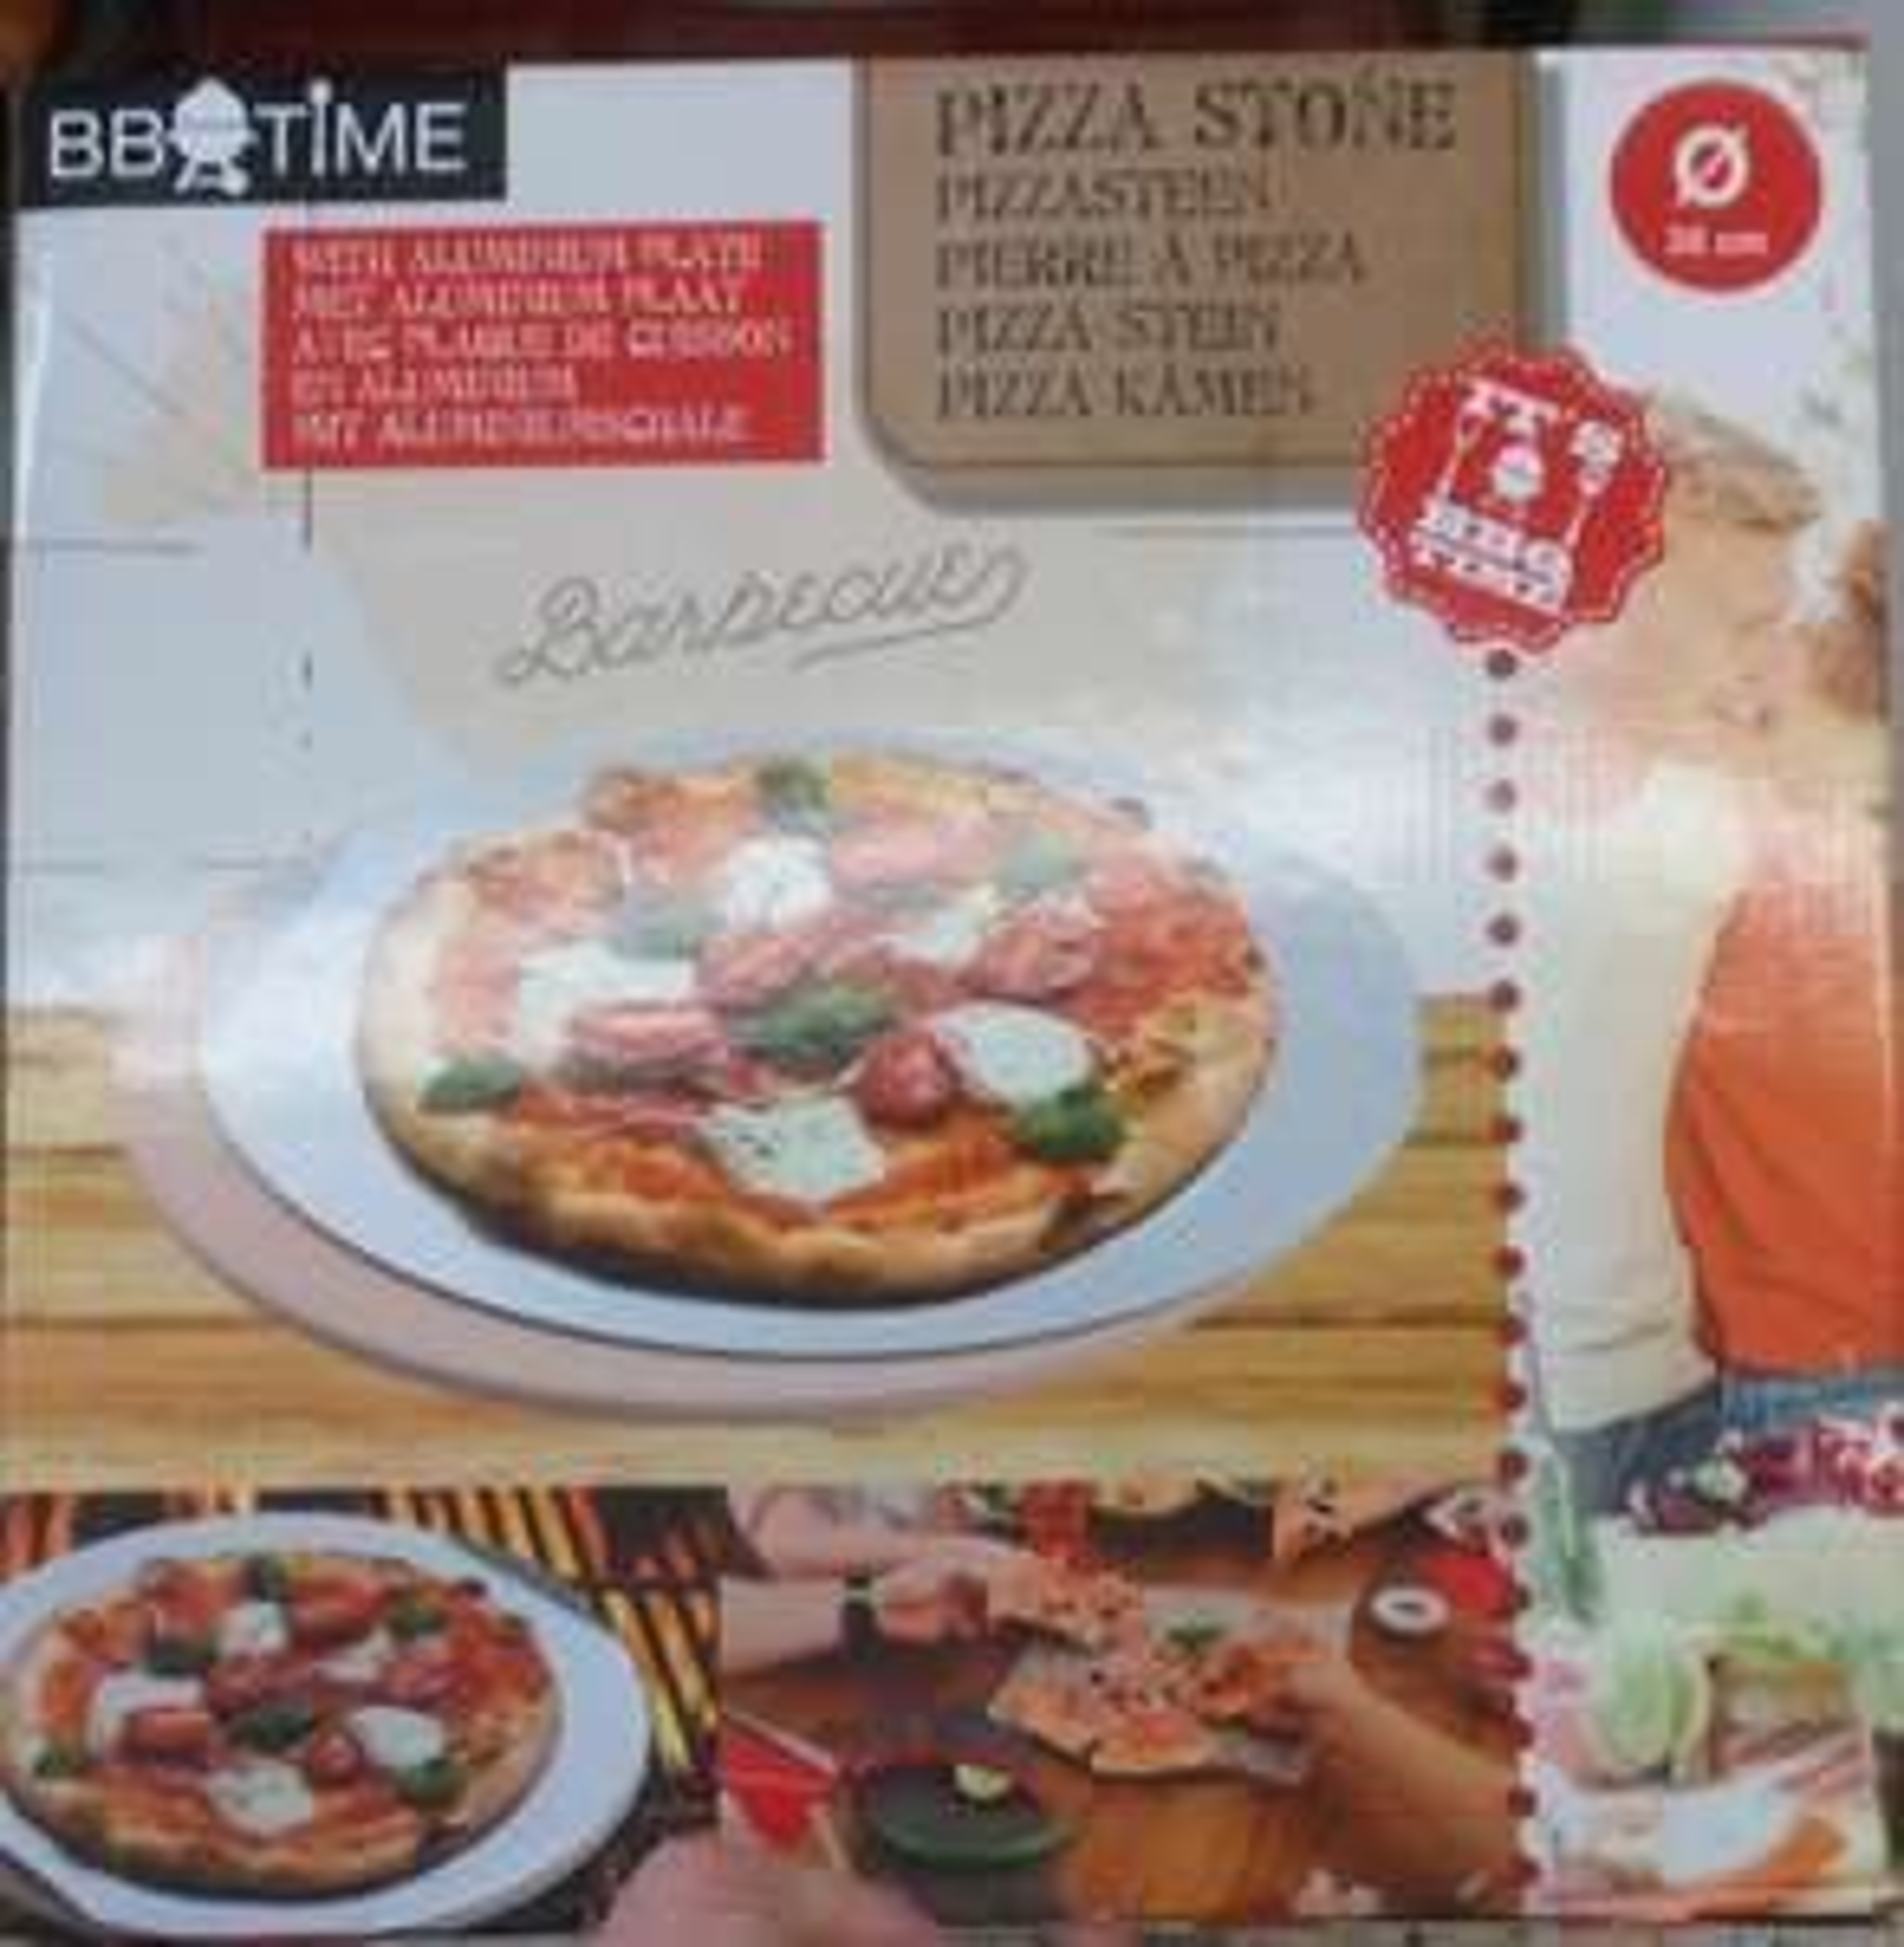 Pierre pizza + plaque alu 35cm